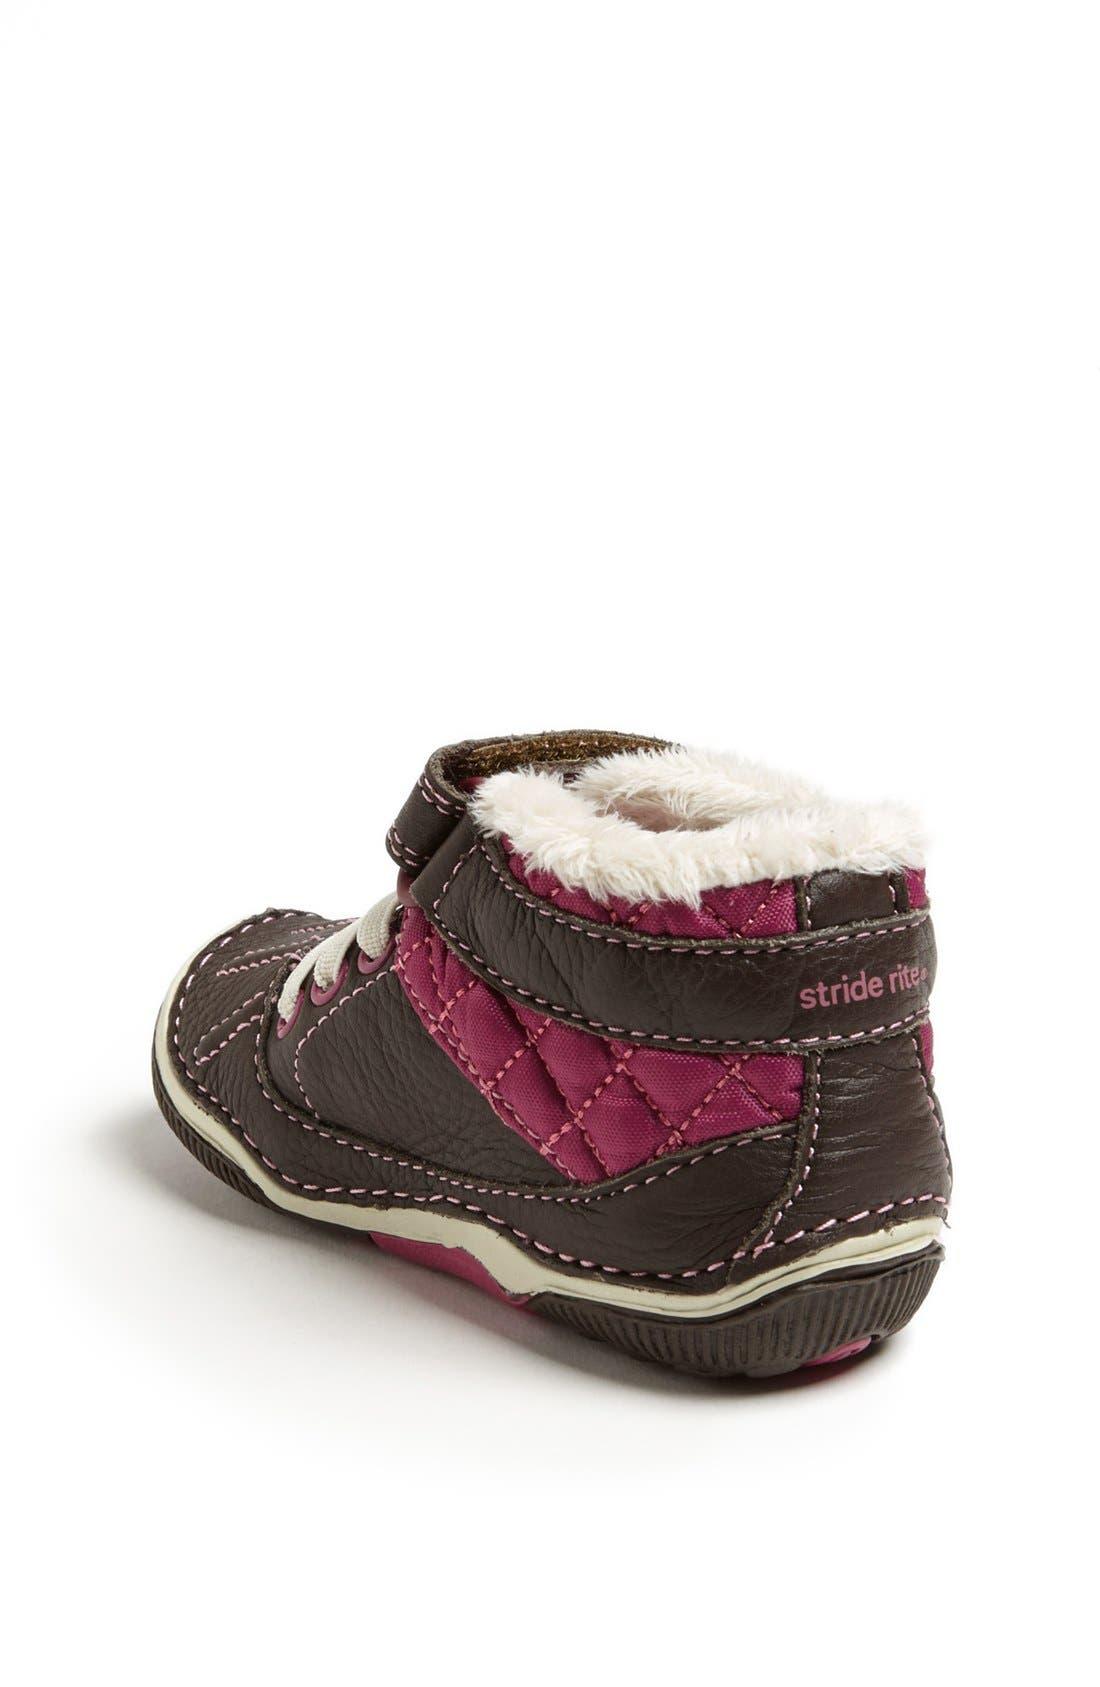 Alternate Image 2  - Stride Rite 'Dakota' Sneaker (Baby, Walker & Toddler)